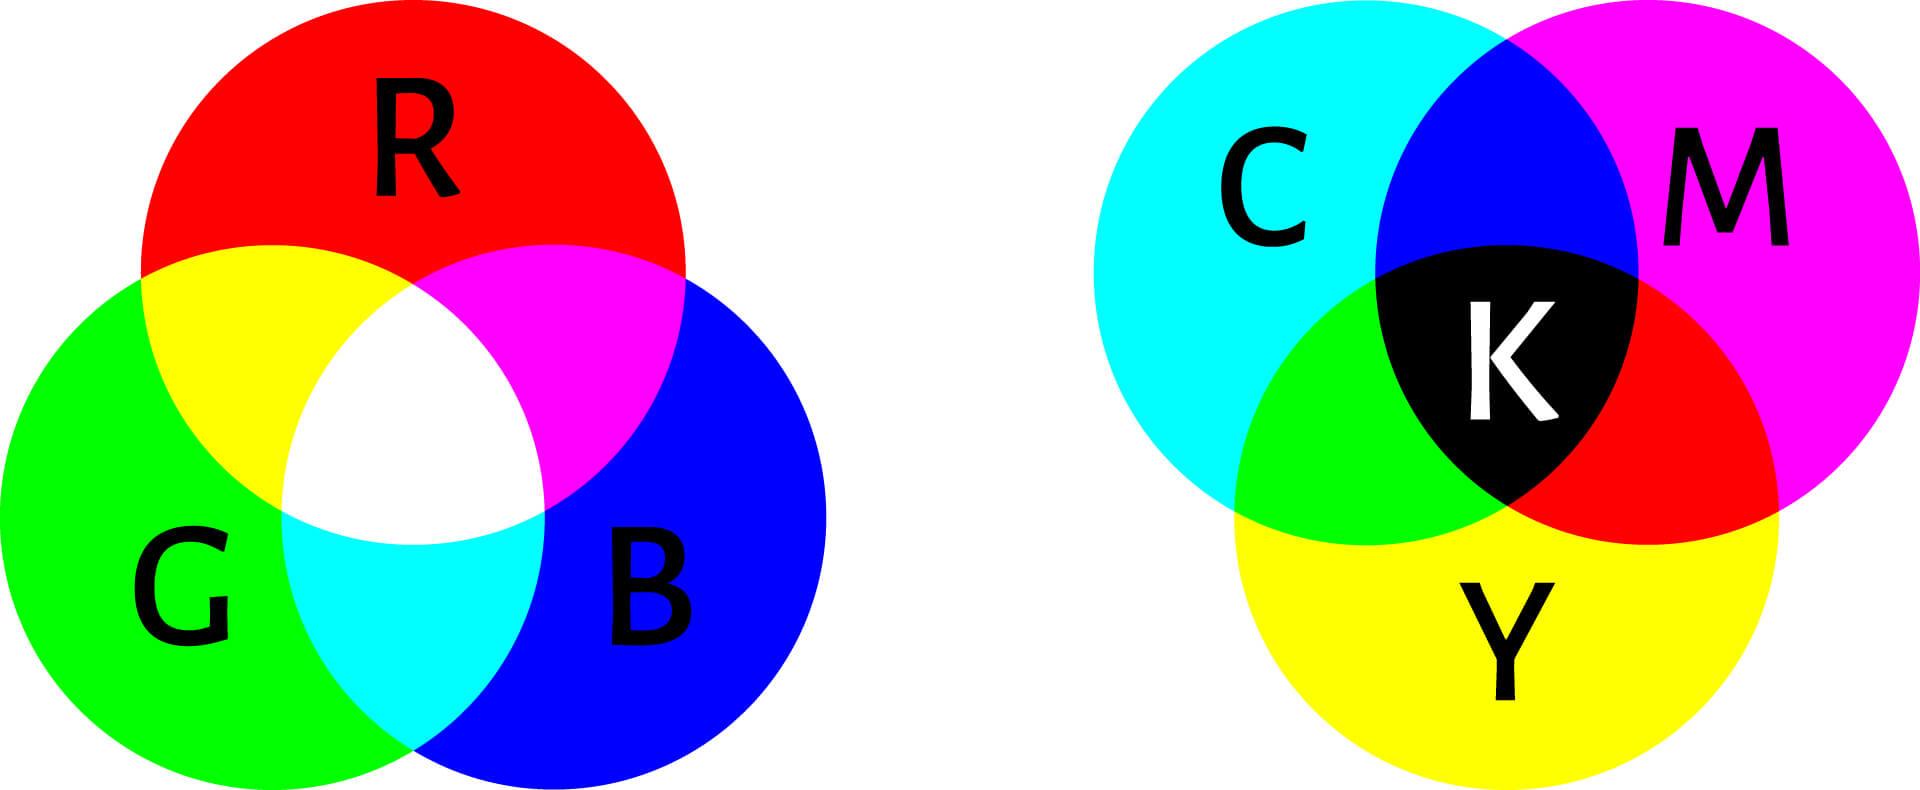 Farbmischung_RGB-CMYK